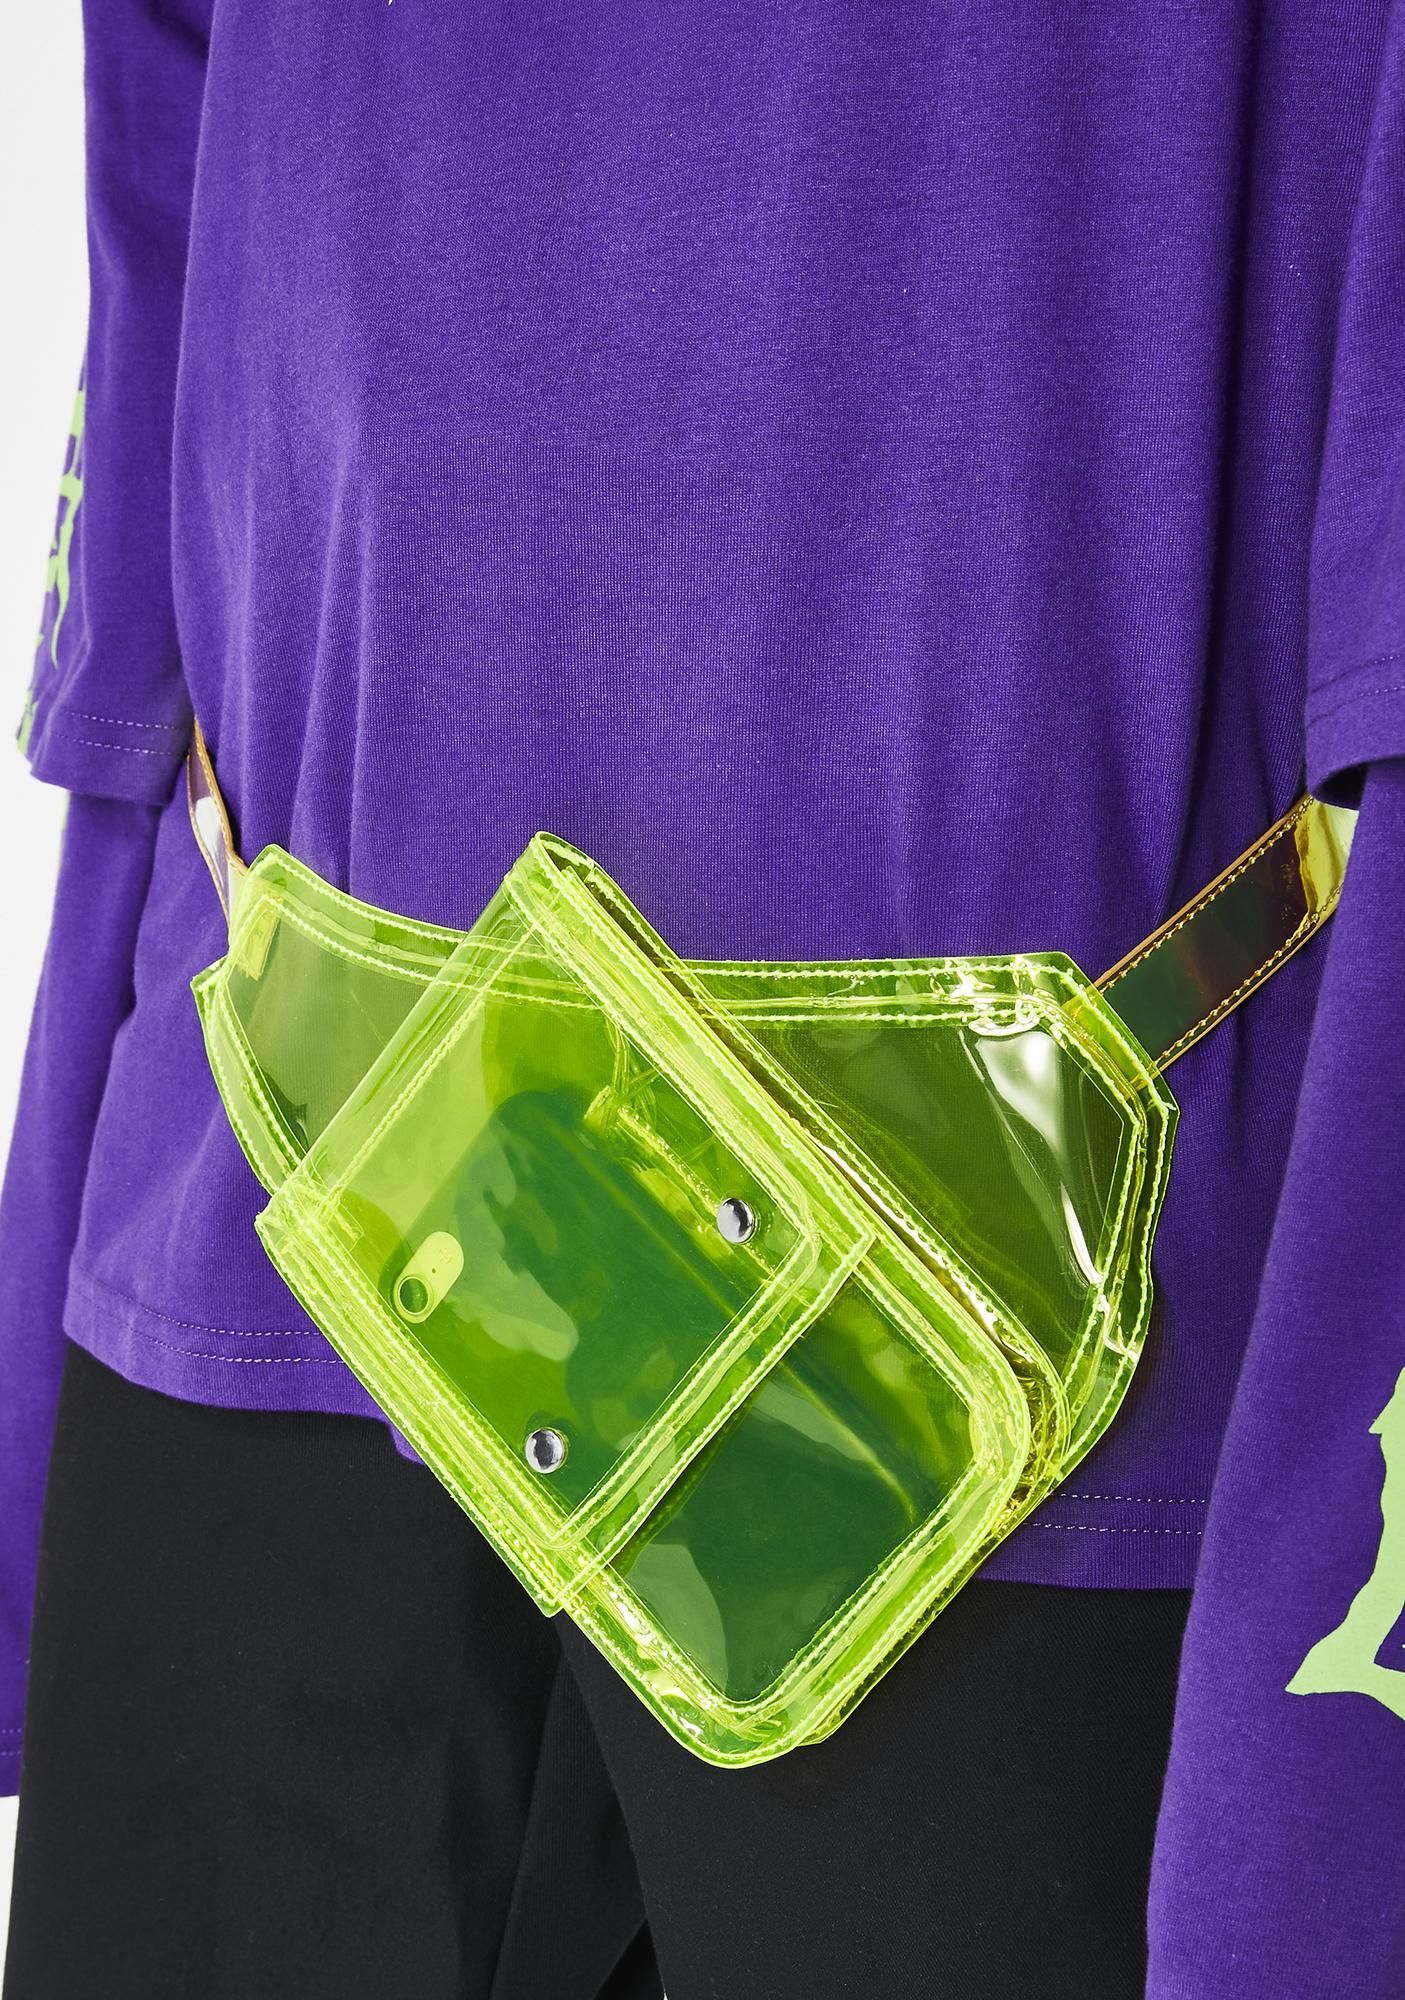 Club Exx Toxxic Chronic LED Bag